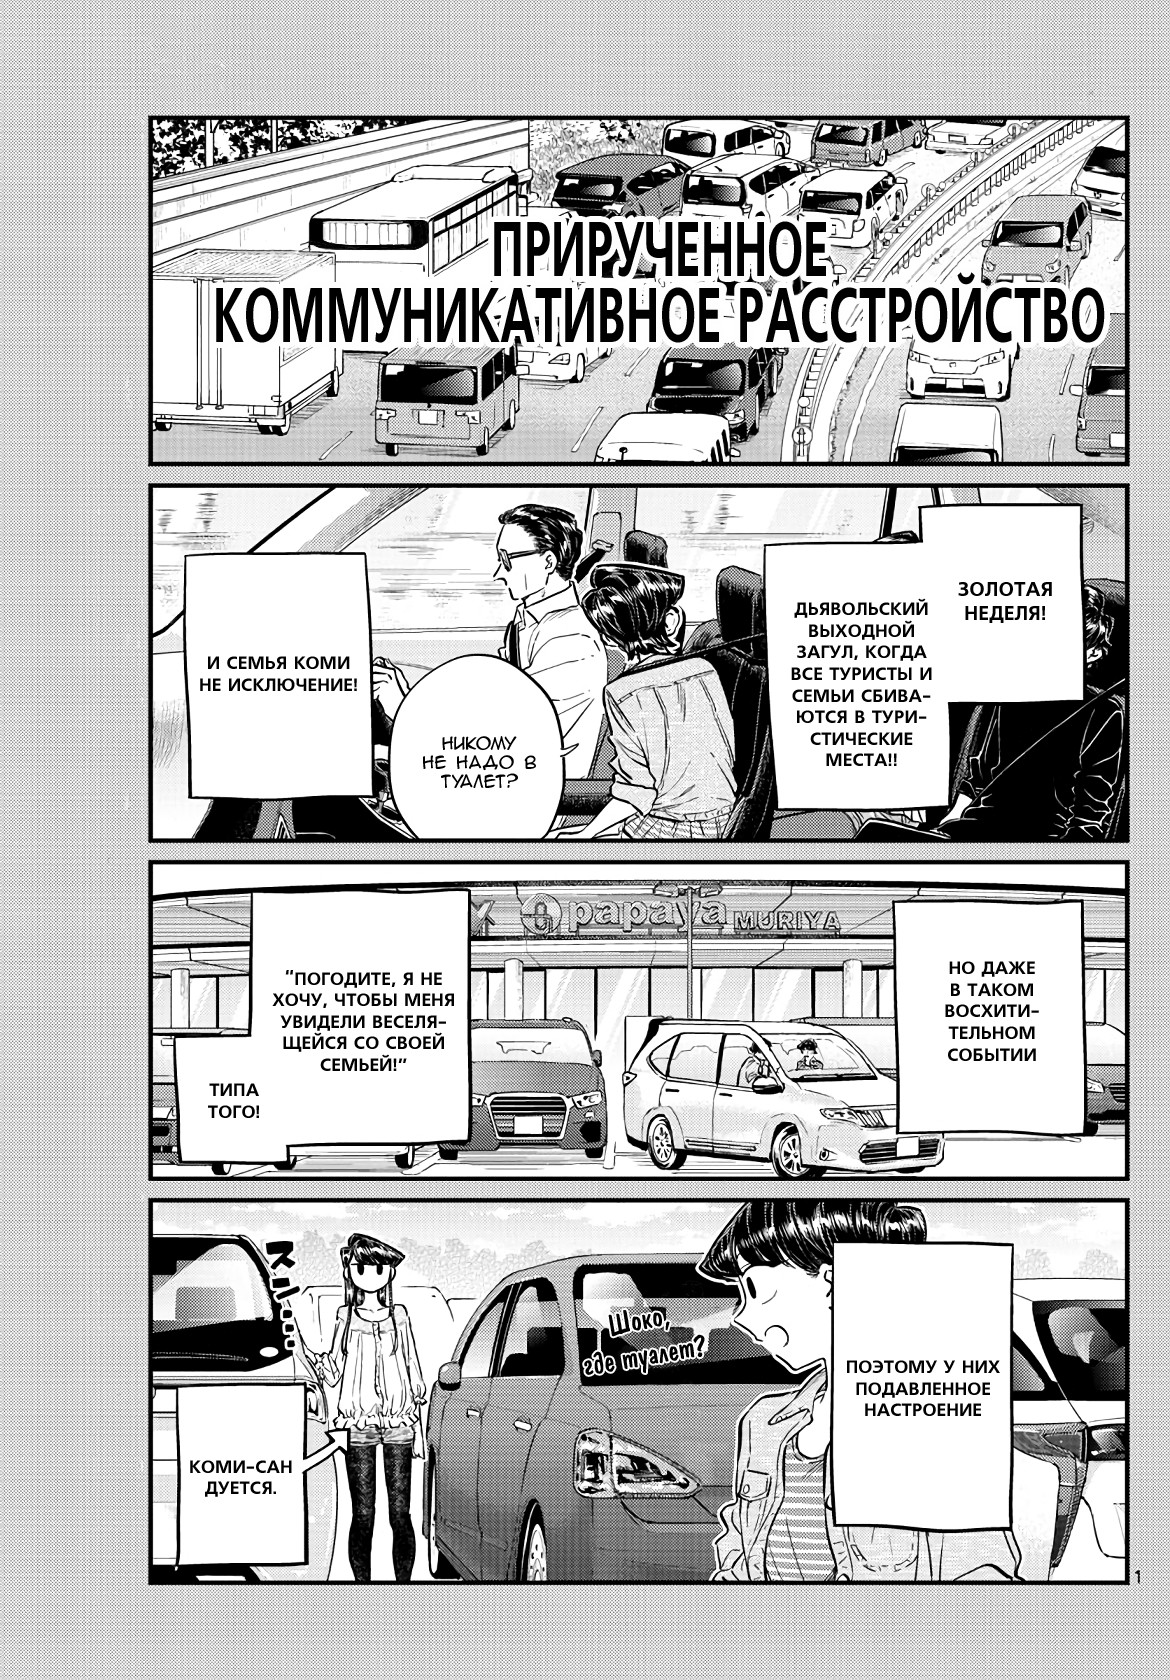 https://r2.ninemanga.com/comics/pic4/12/27788/1334180/1556050579948.jpg Page 1